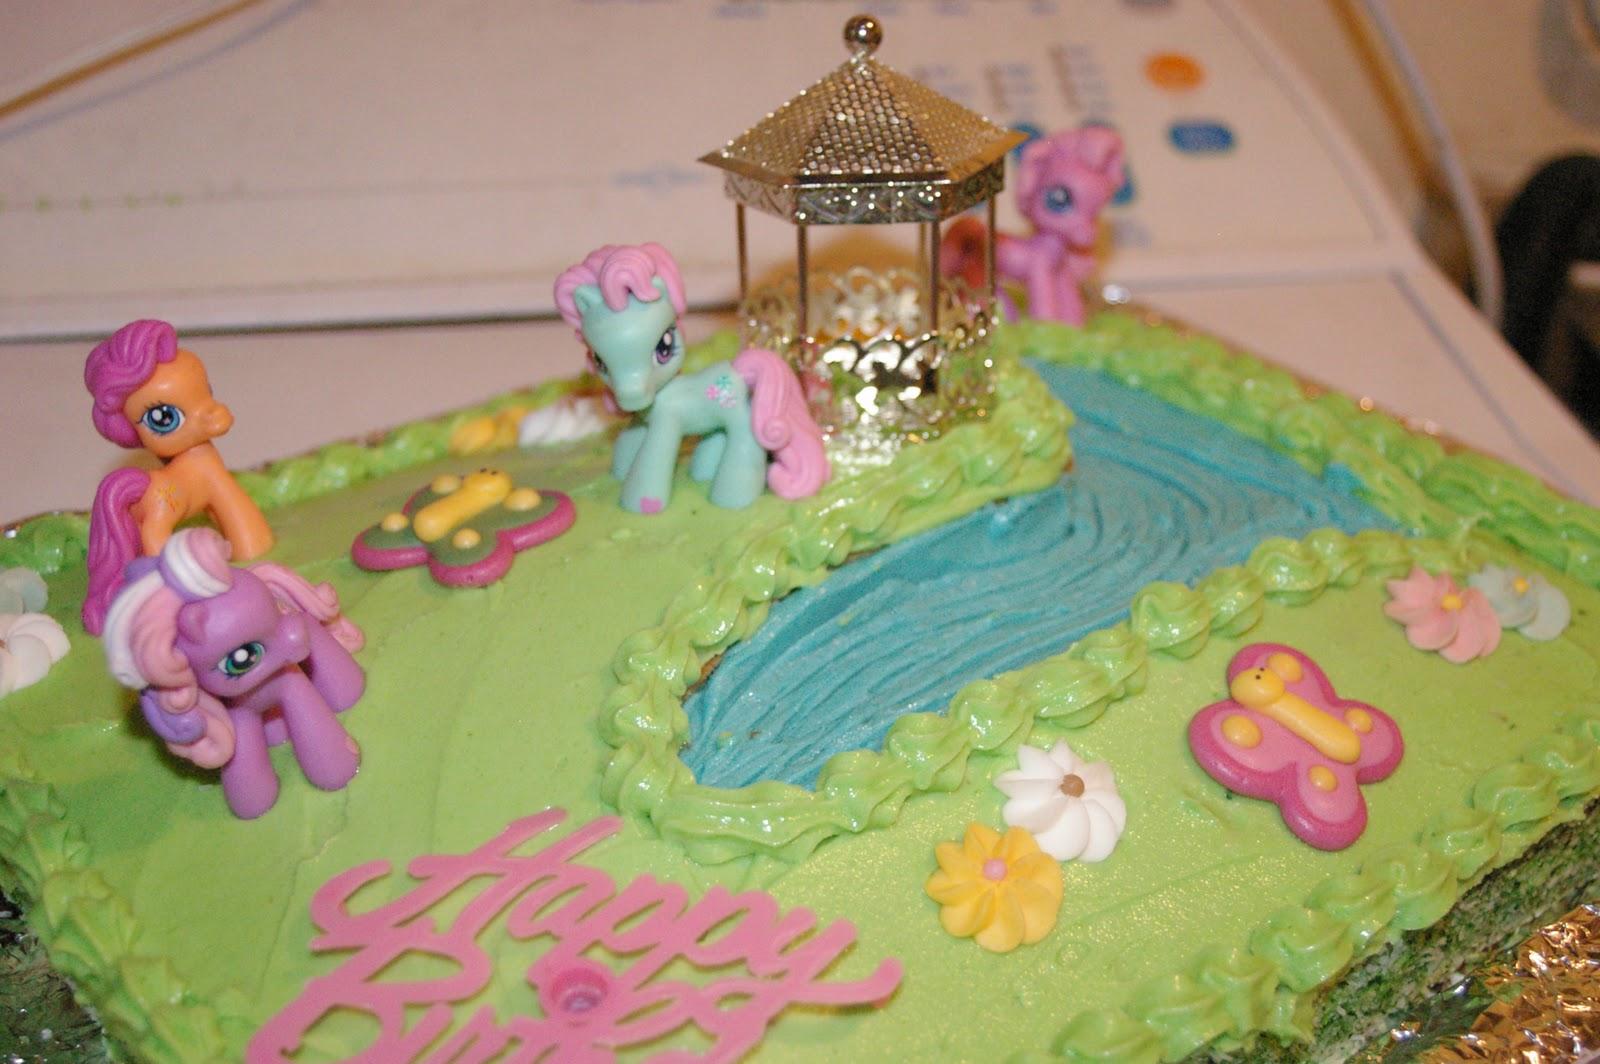 The Birthday Cakes So Far Domesblissity